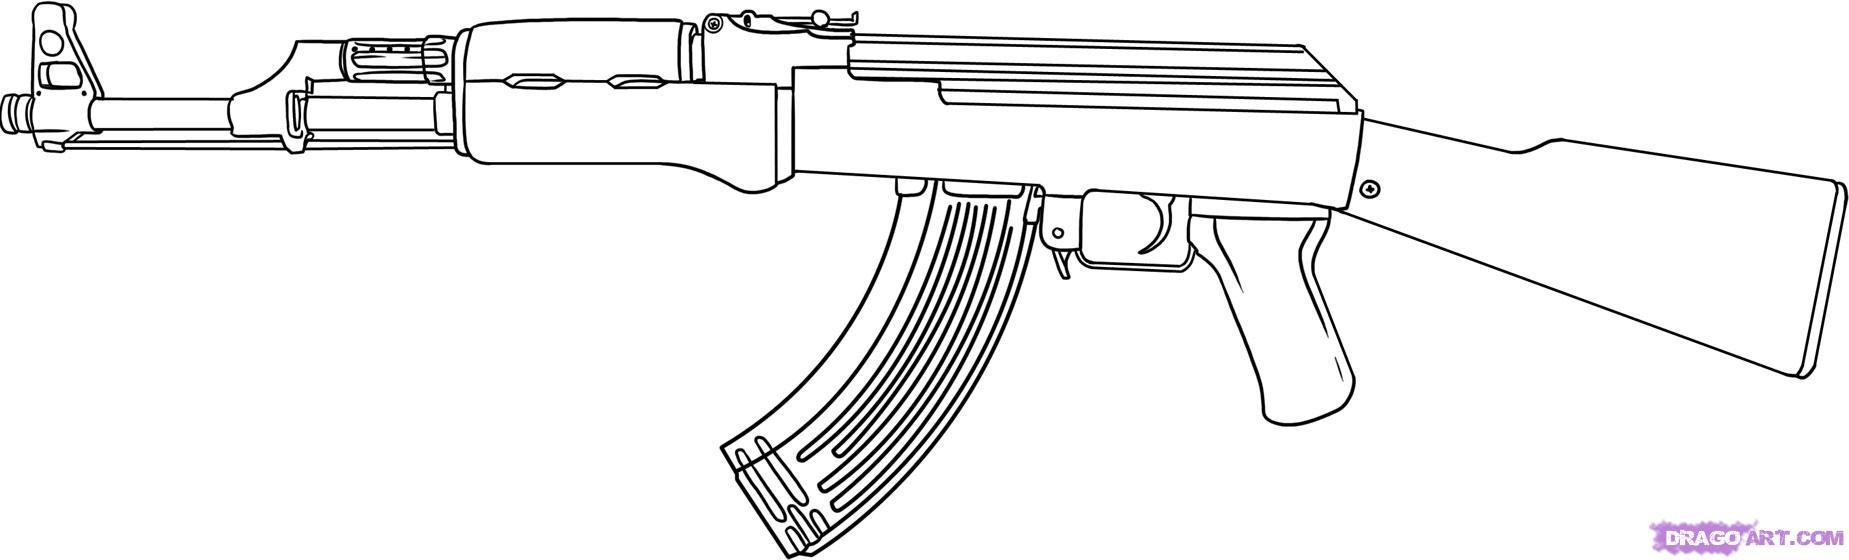 Drawn weapon pistol Bestofcoloring Military Kids At Boys